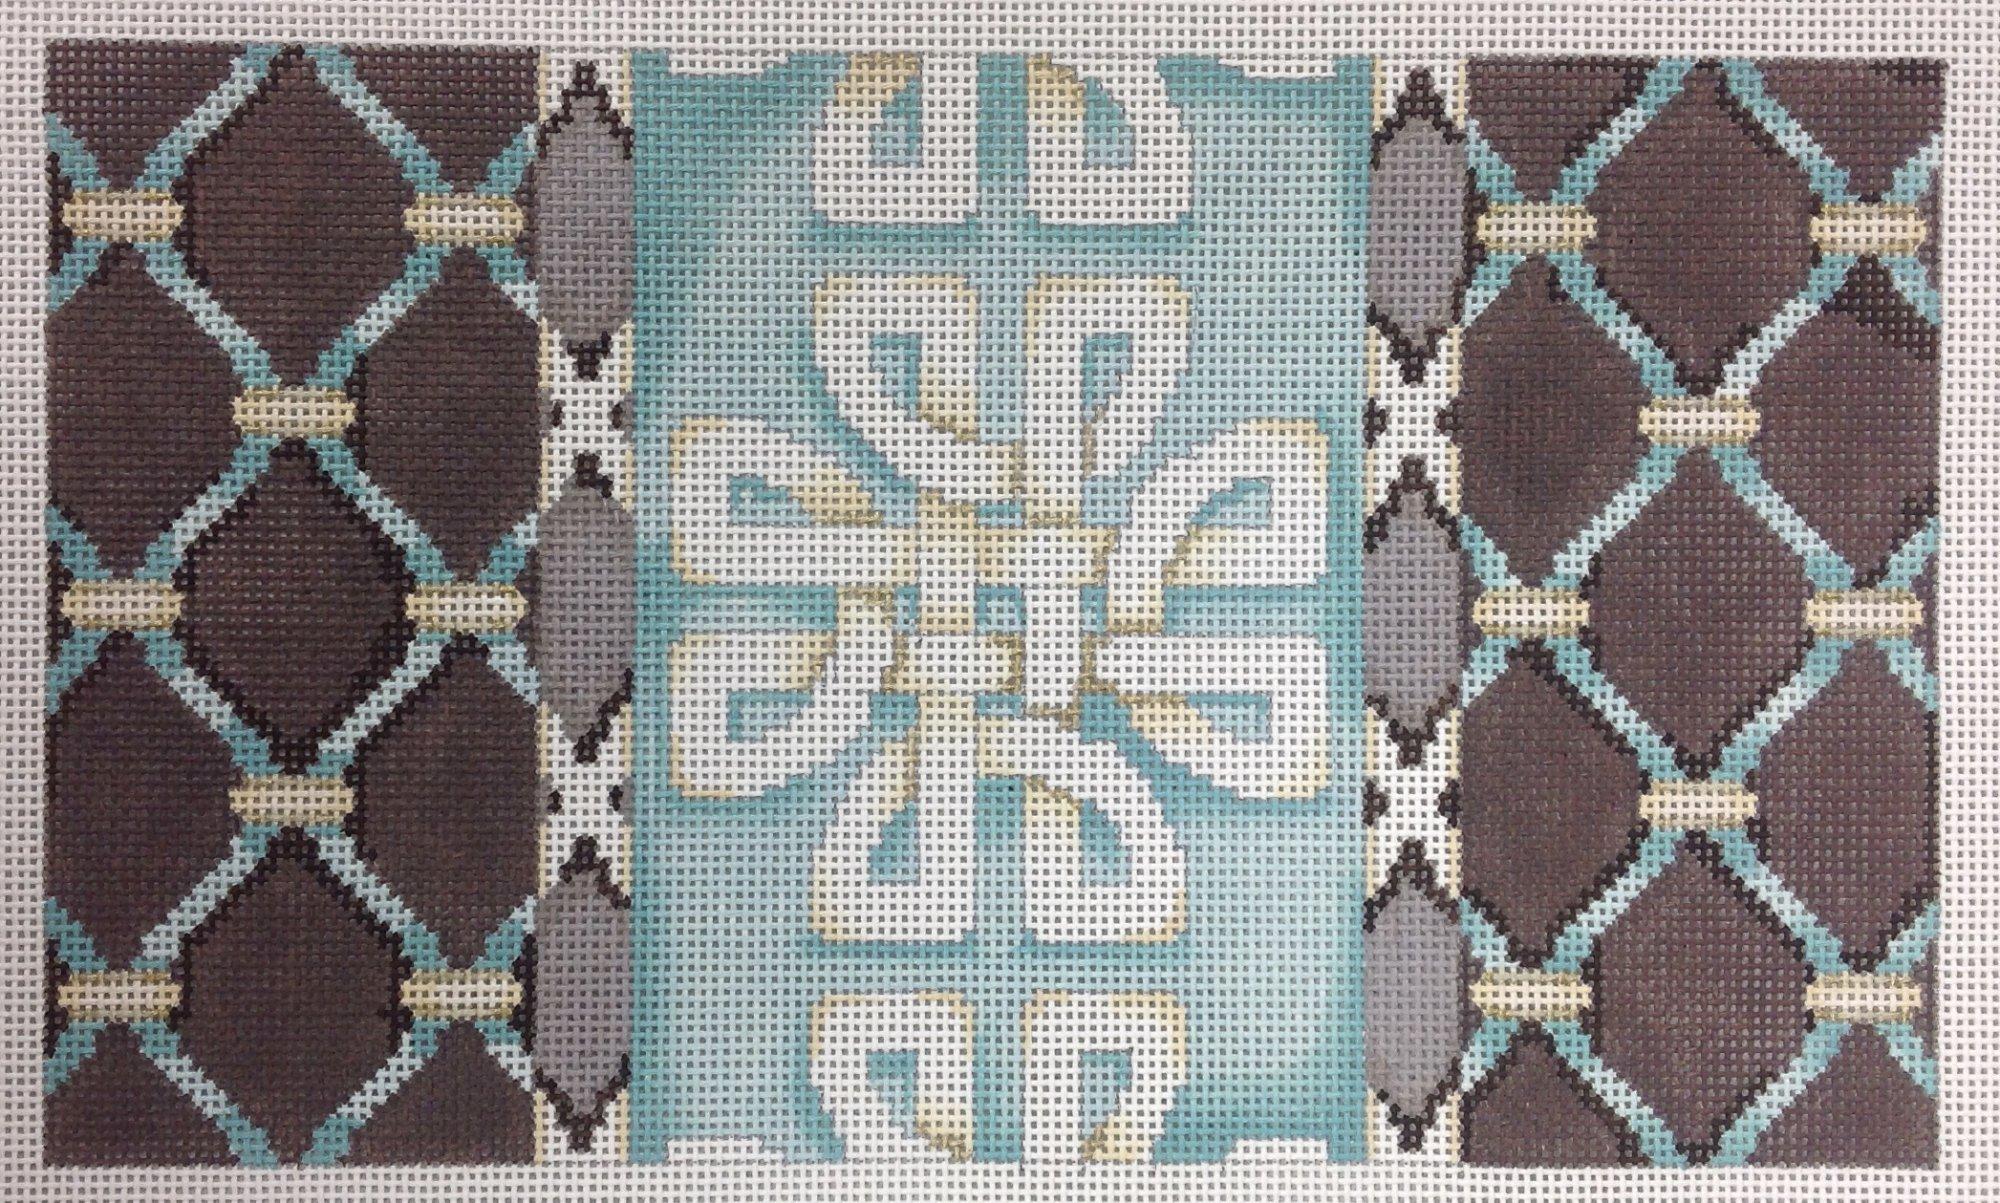 claremont cross rectangle